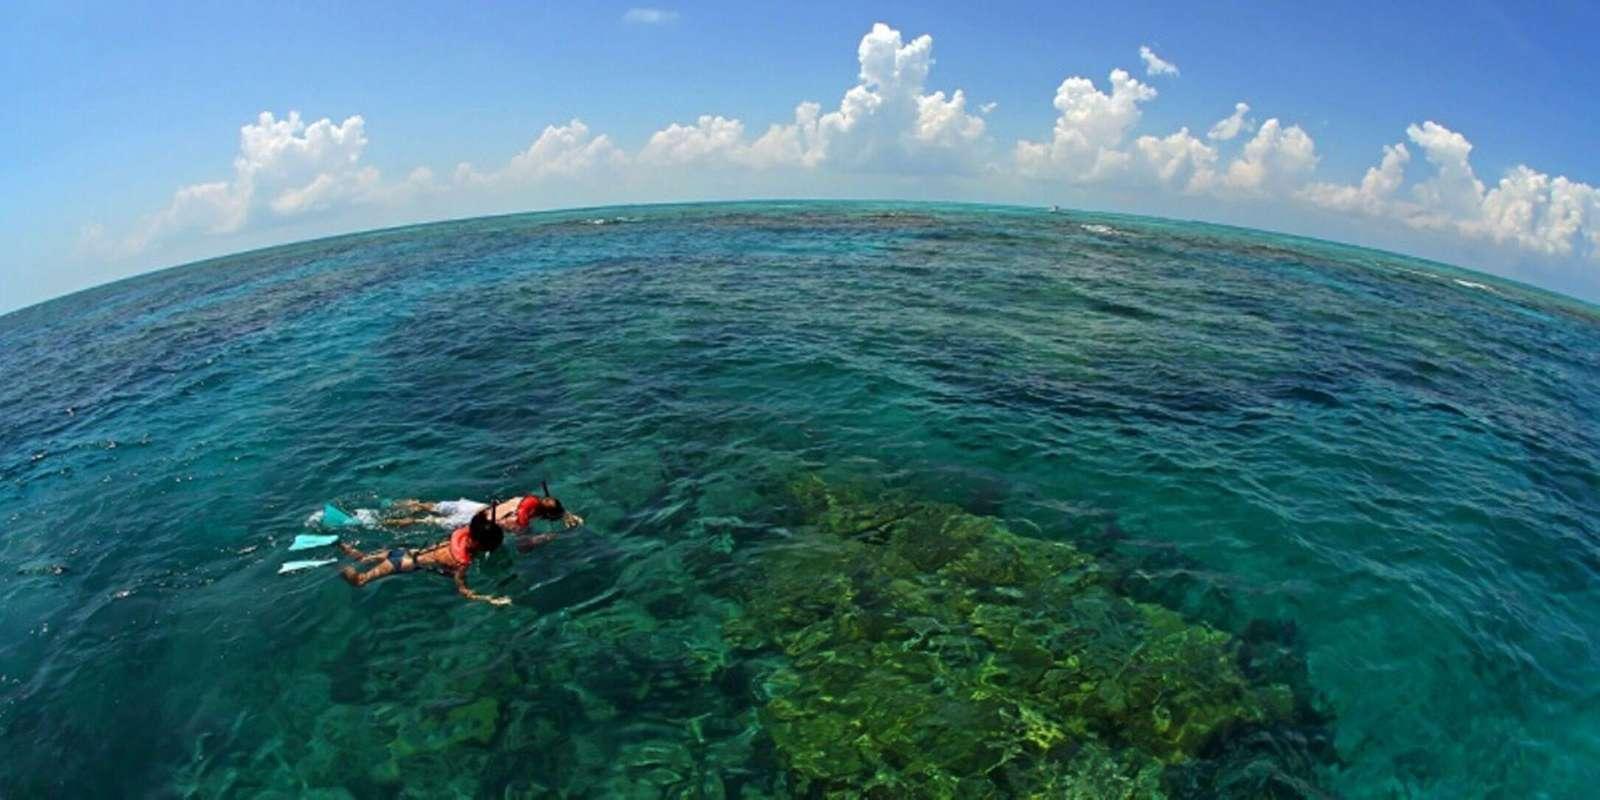 Explore the Florida Keys